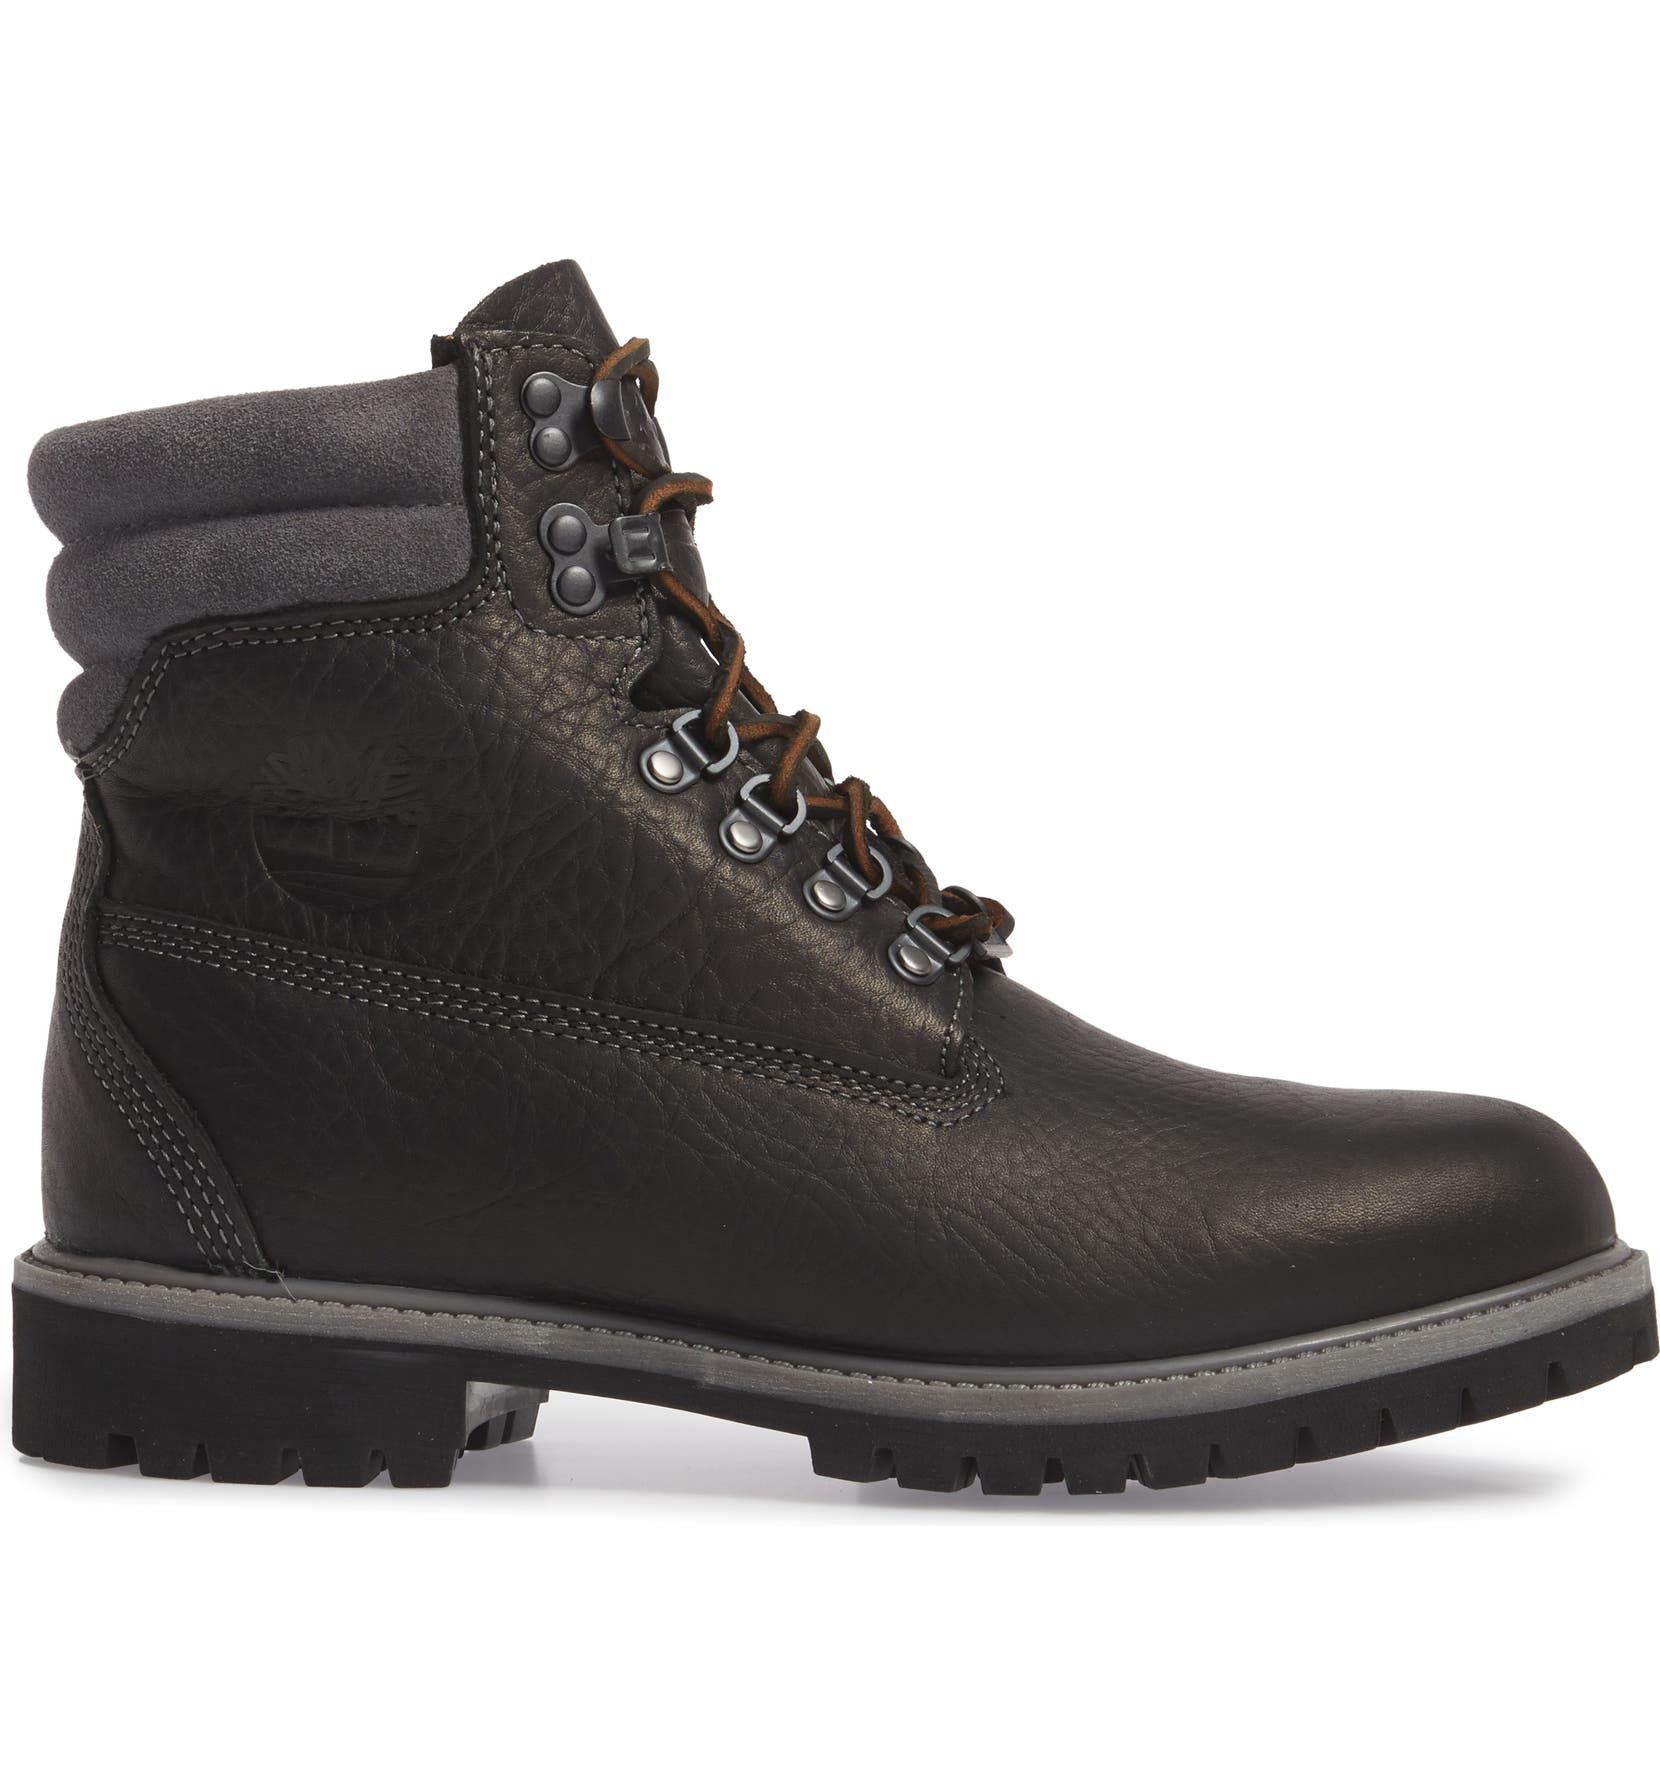 60e5278077e 640 Below Plain Toe Waterproof Boot